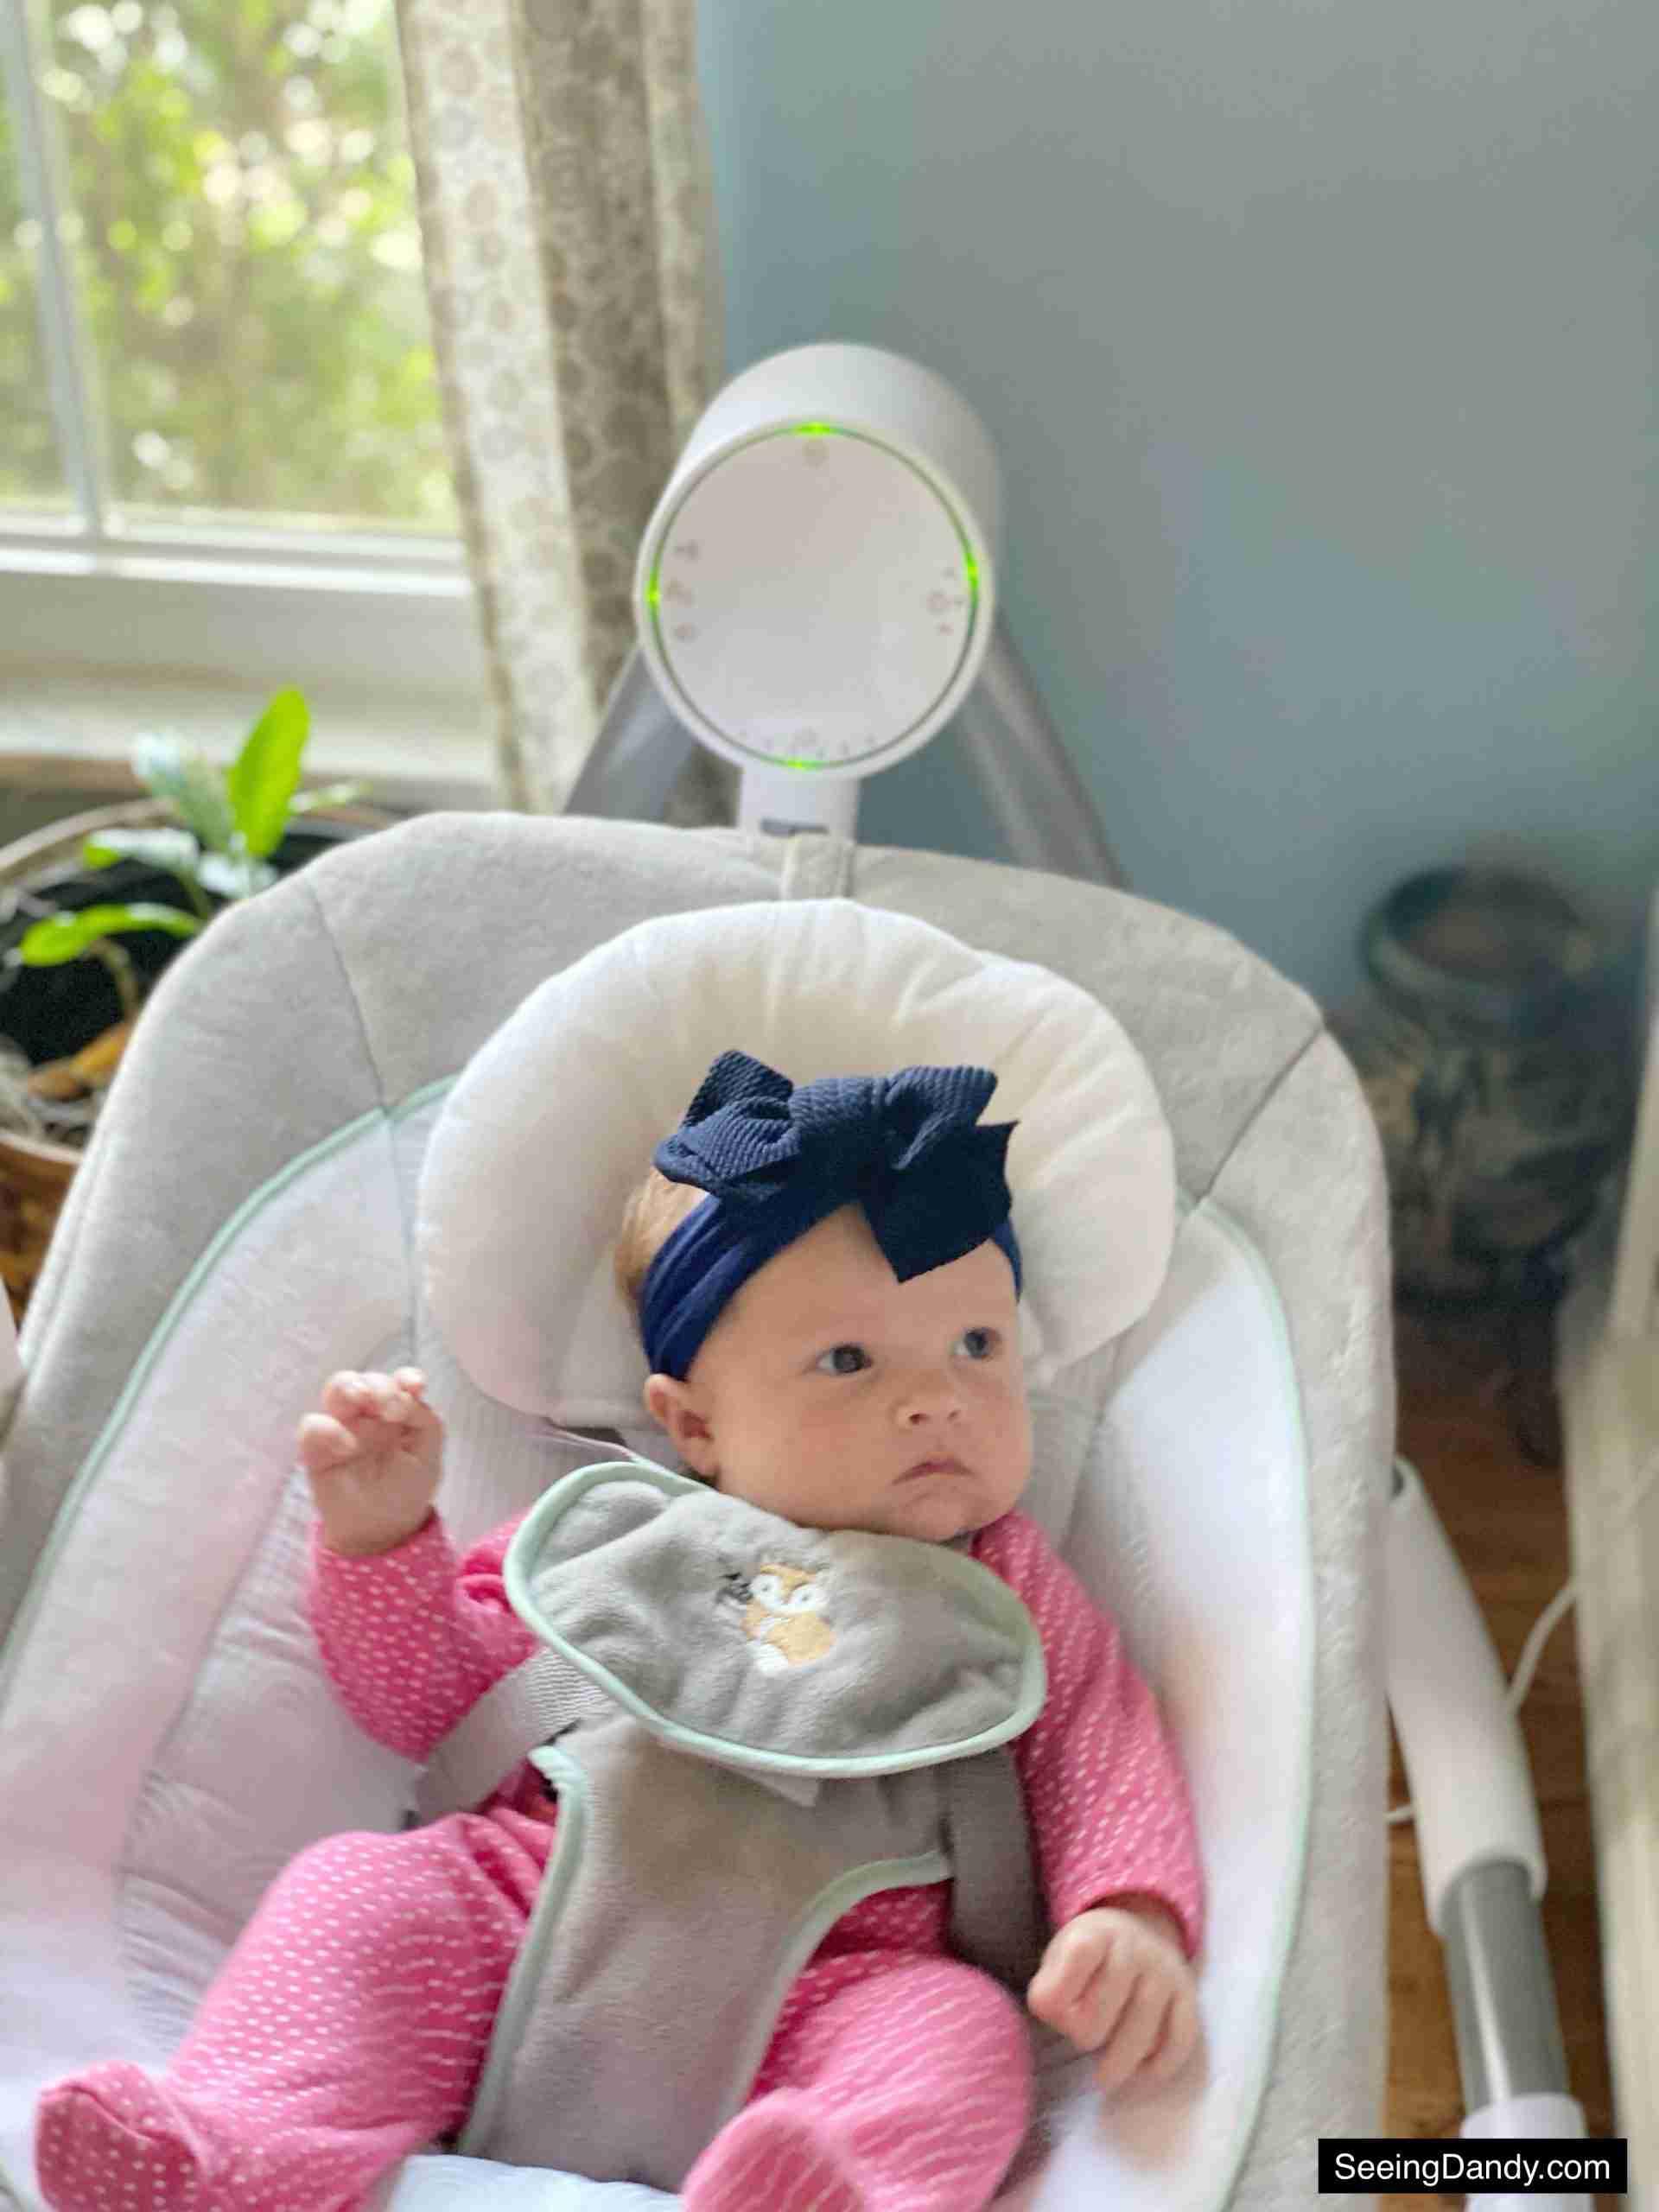 ingenuity baby swing, infant gear, baby shower gift ideas, anyway sway swing